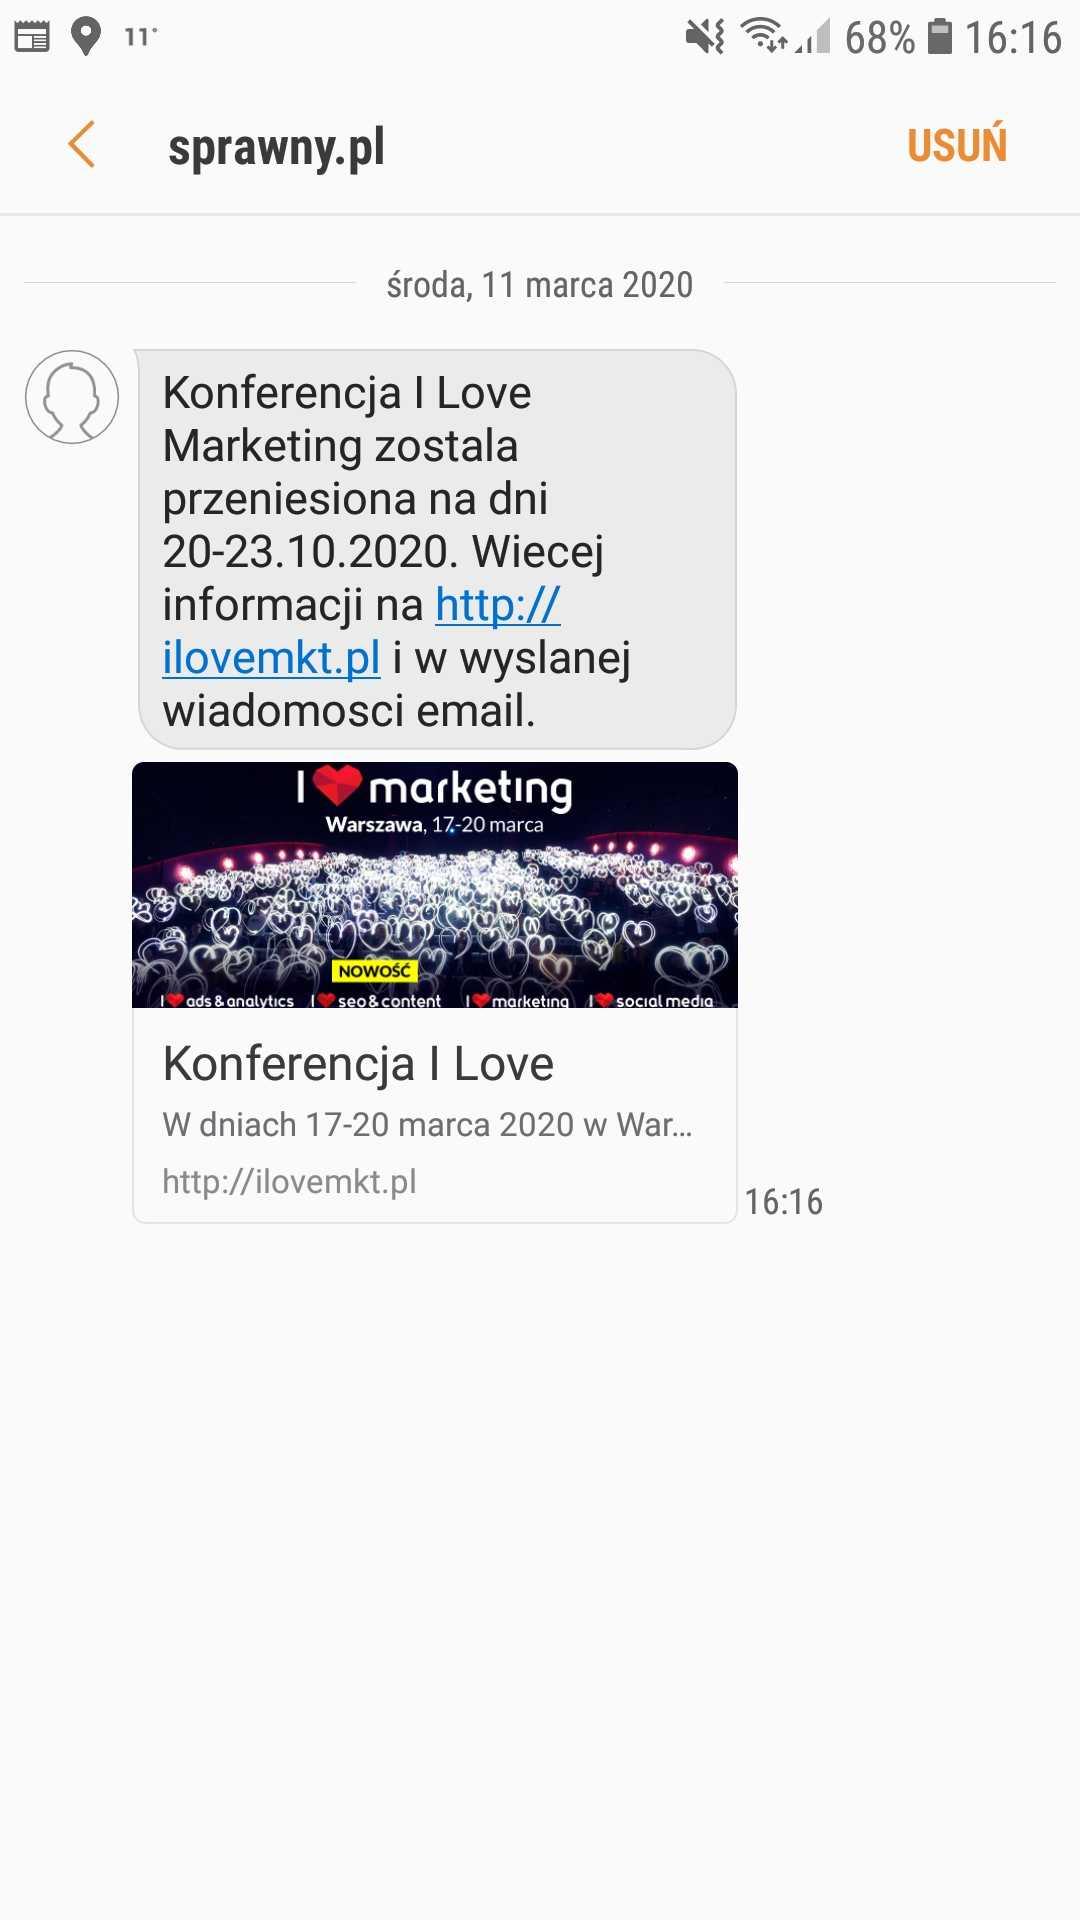 SMSAPI Konferencja Sprawny Marketing SMS